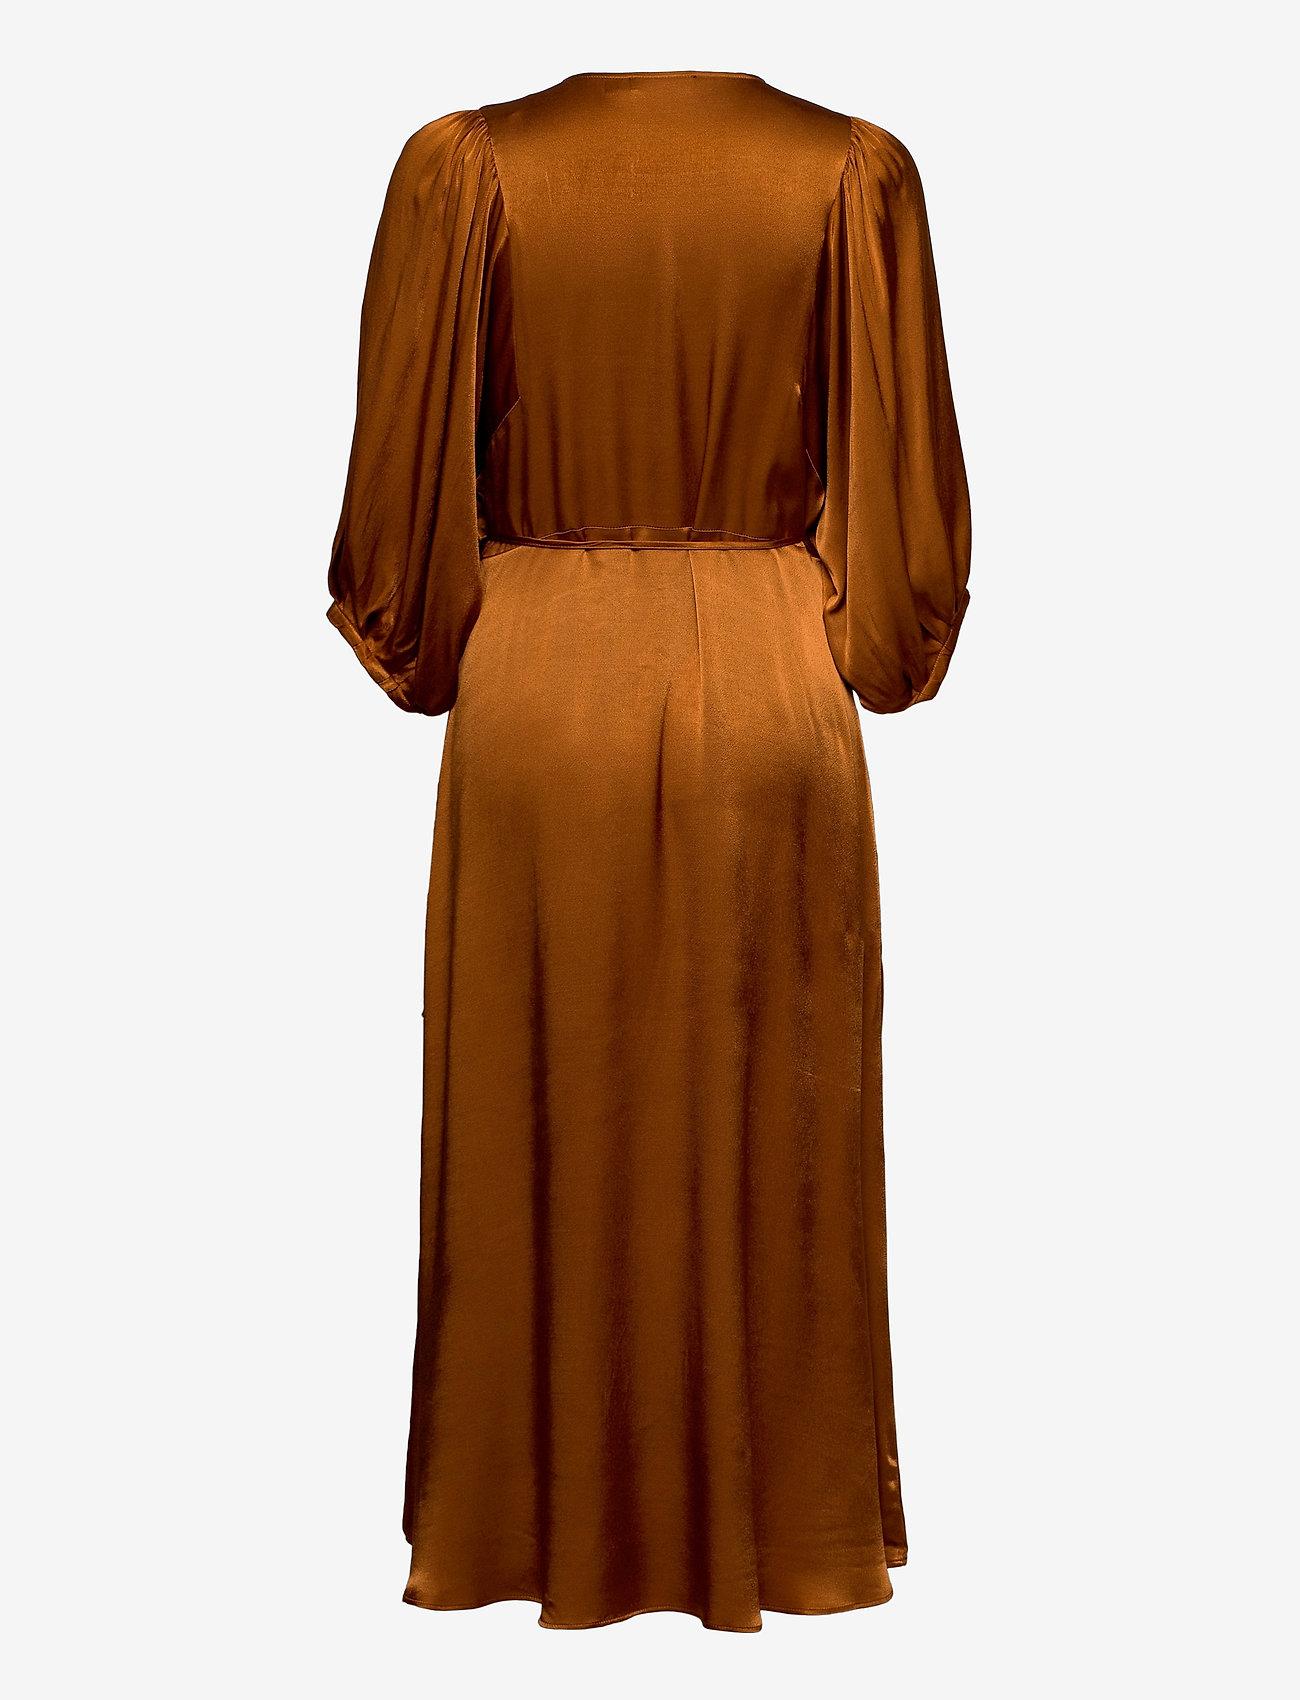 Slnanuli Dress 3/4 (Sugar Almond) (97.50 €) - Soaked in Luxury yTOAf